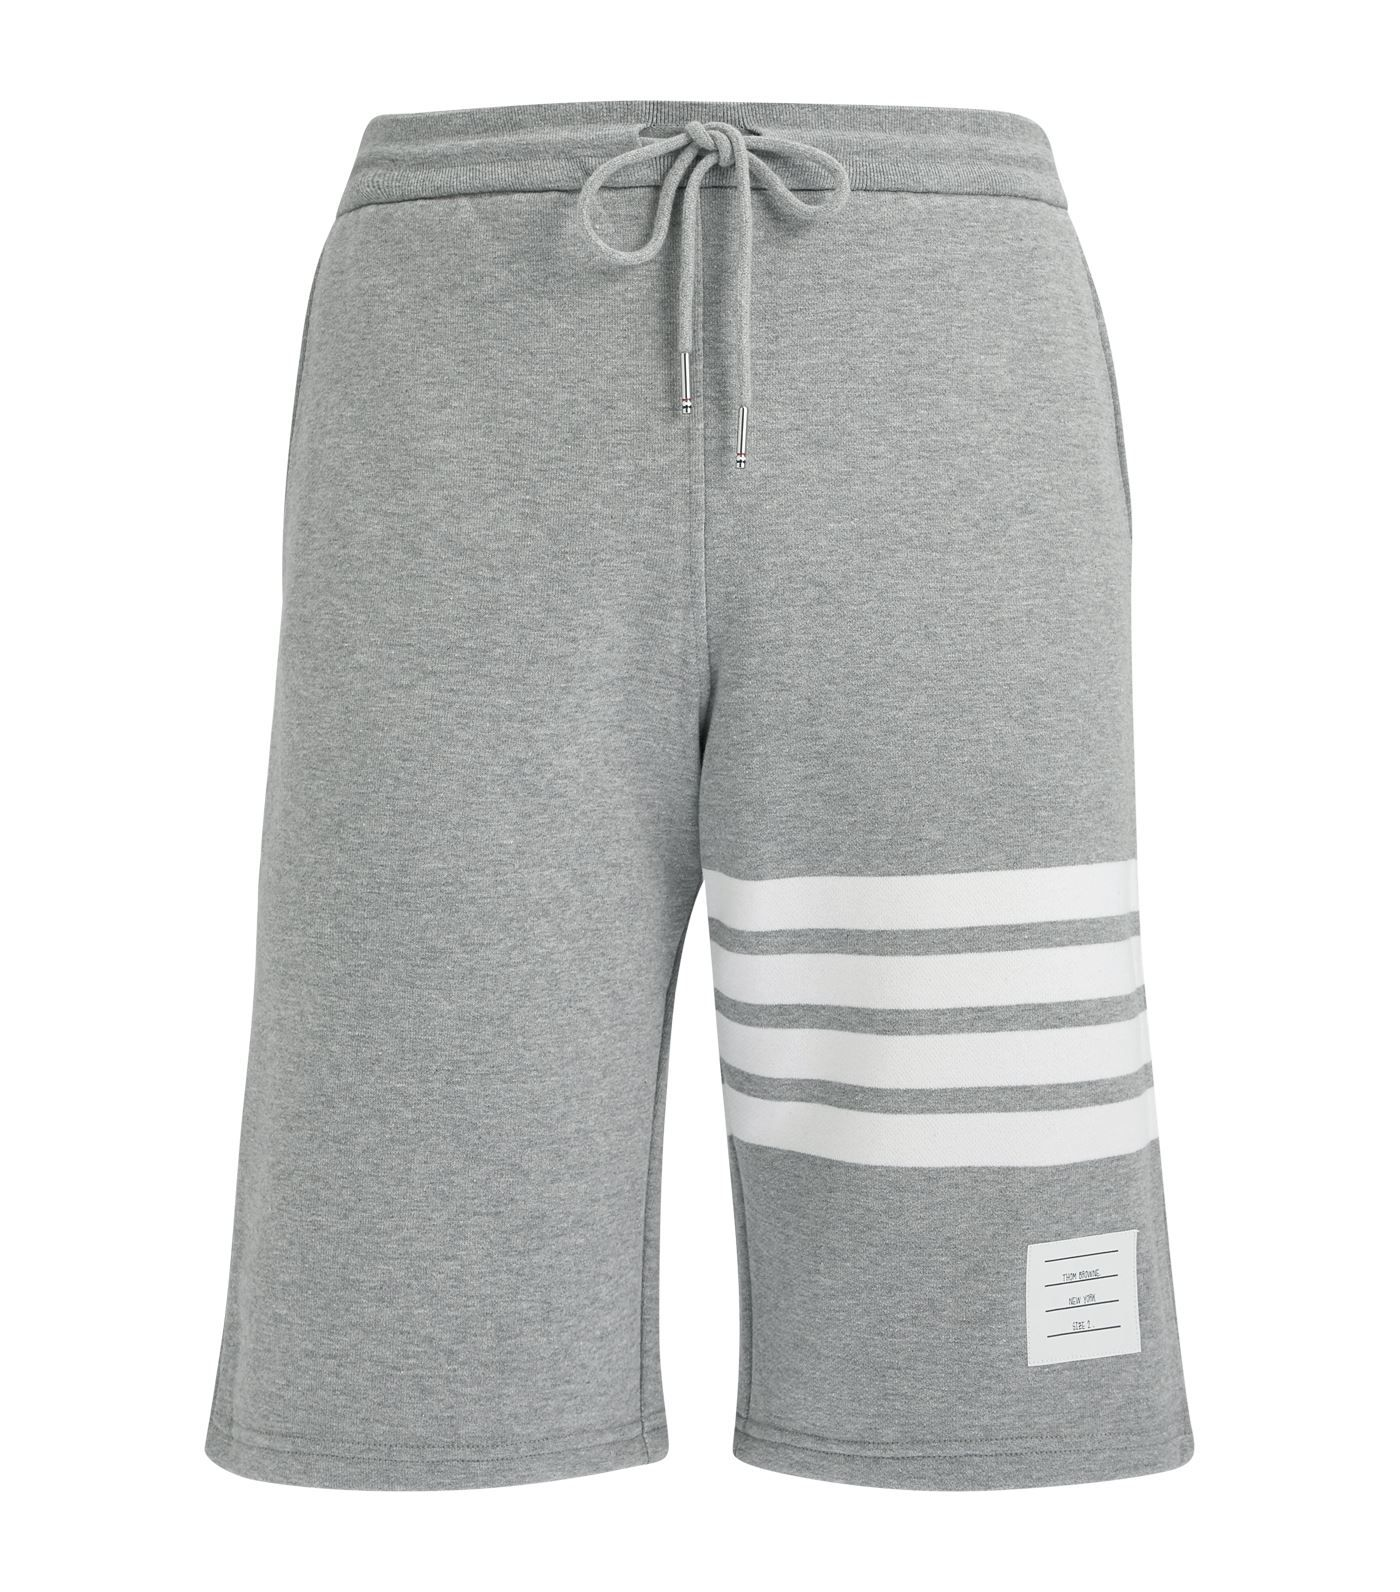 dcc195ac94c85 THOM BROWNE THOM BROWNE - LOGO PATCH STRIPED SEERSUCKER SWIM SHORTS - MENS  - LIGHT BLUE. #thombrowne #cloth | Thom Browne in 2019 | Thom browne, Swim  shorts ...